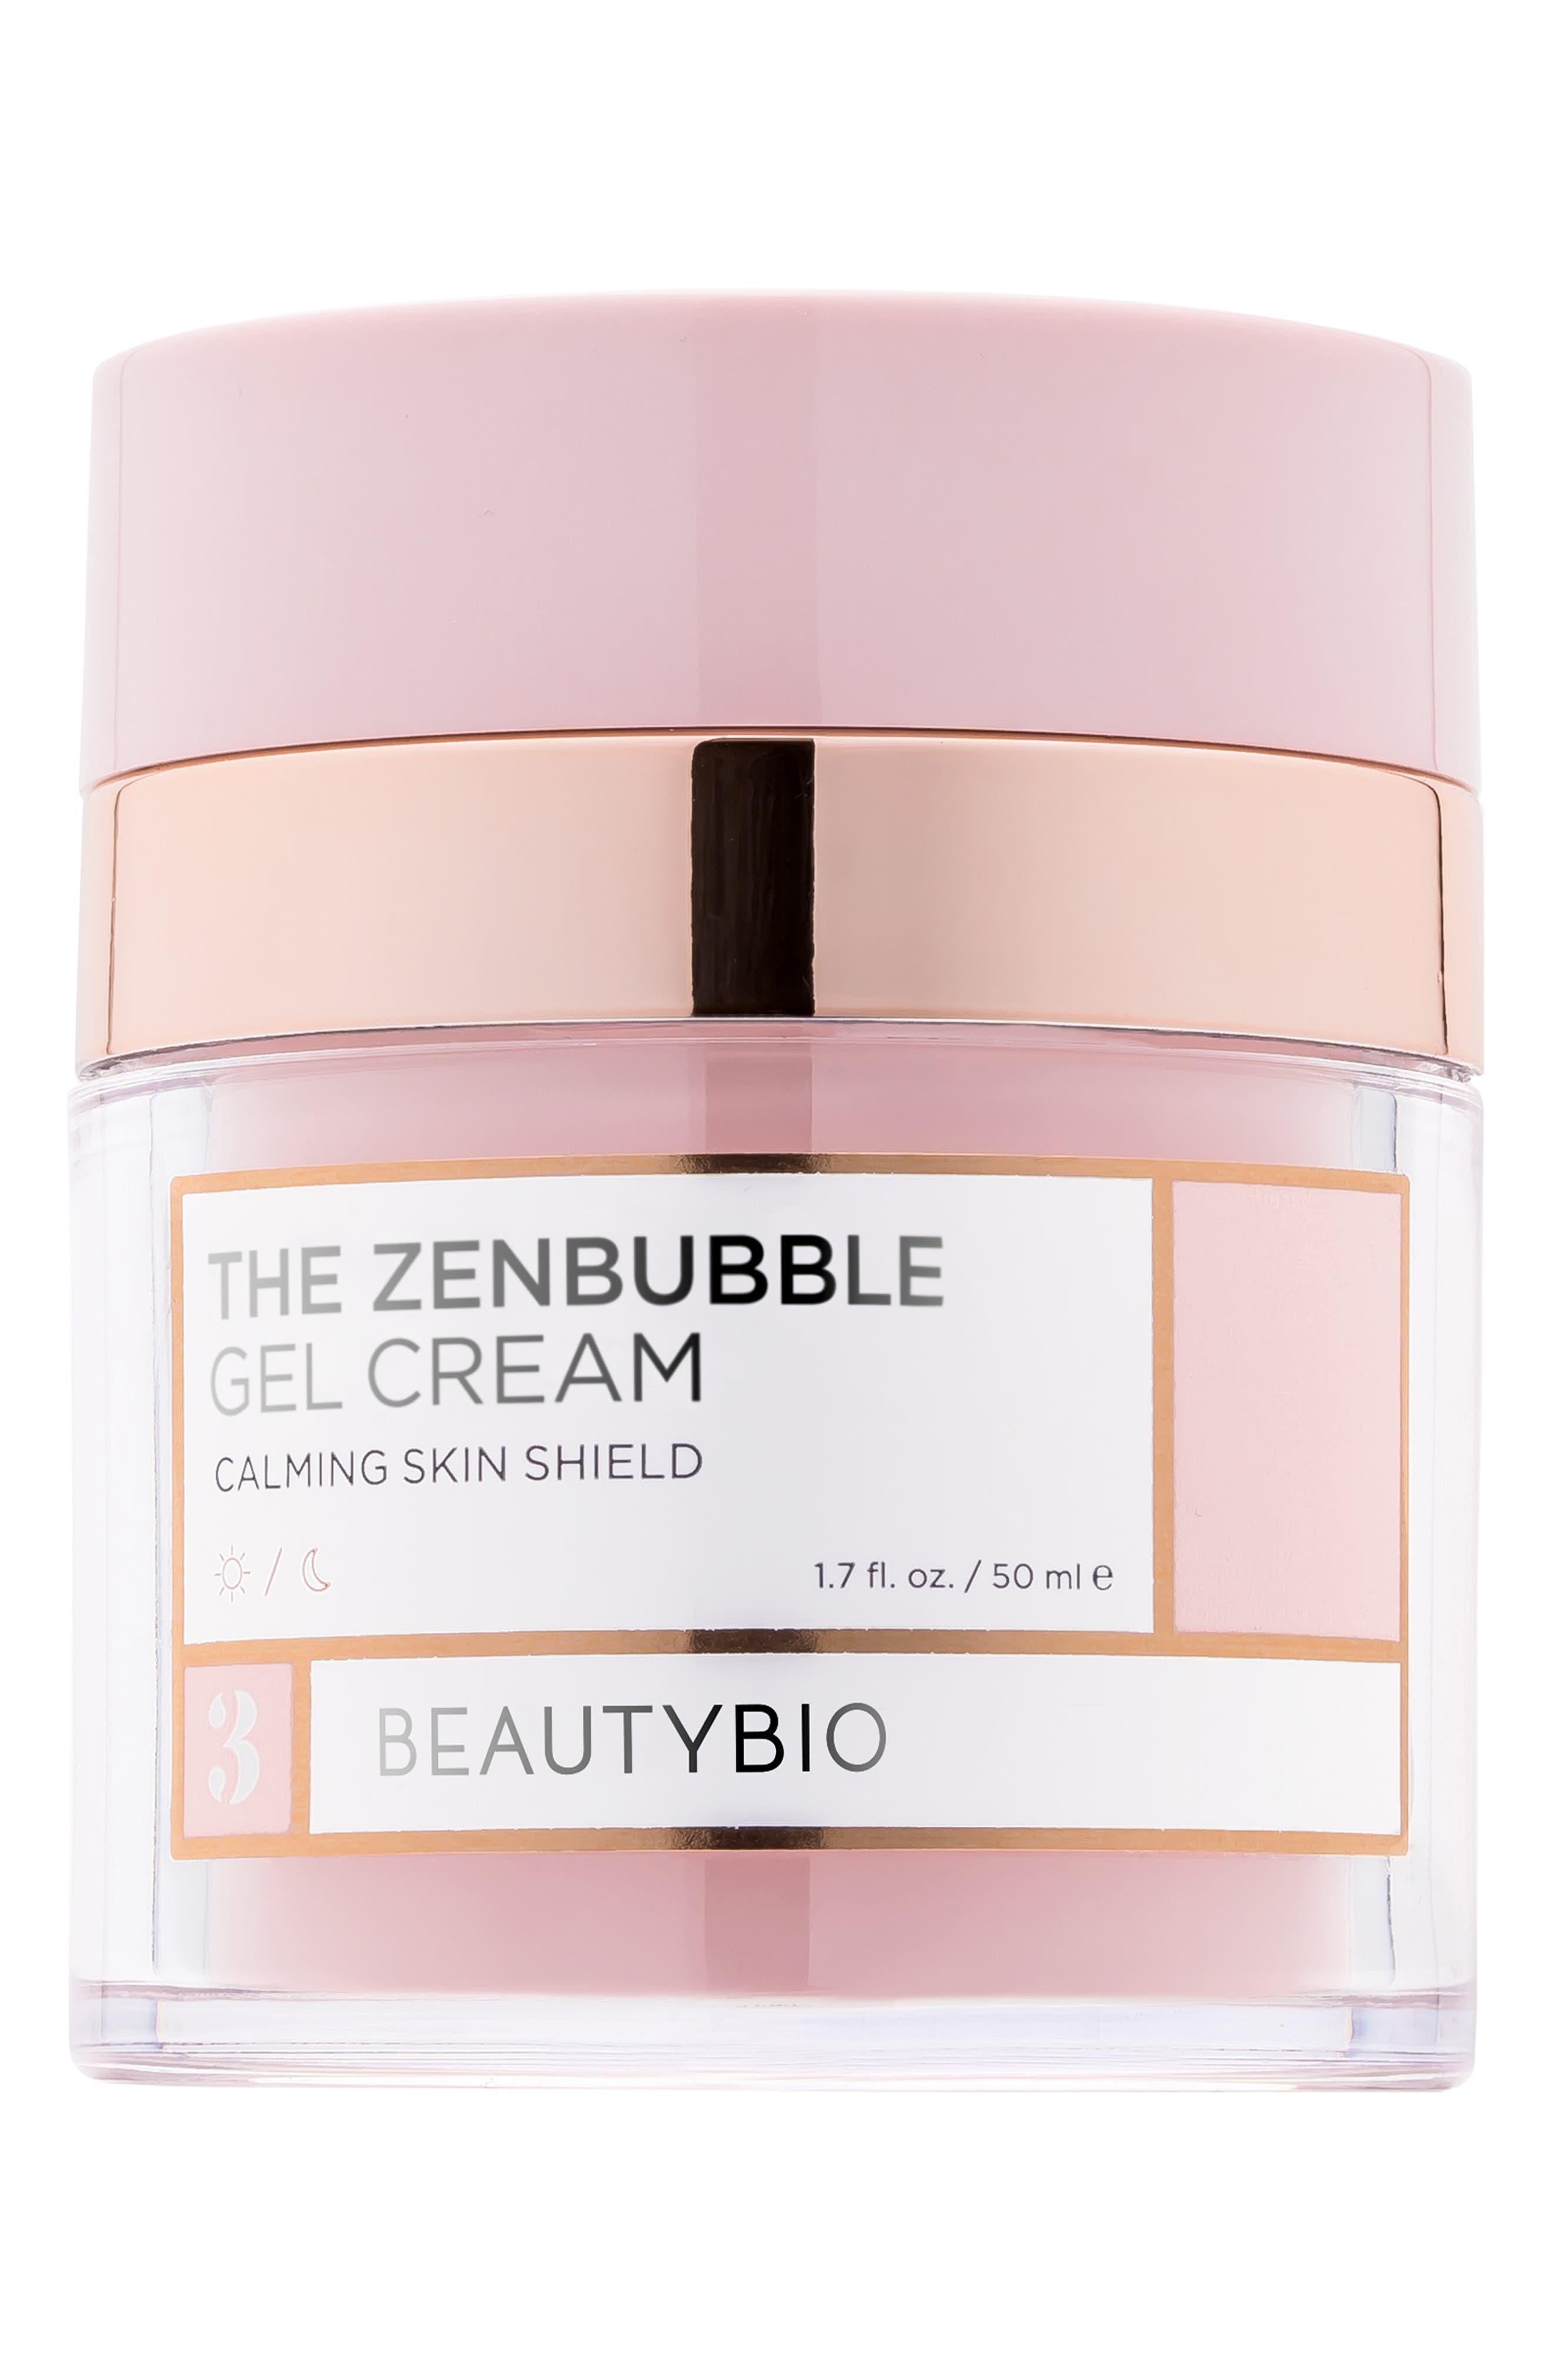 The Zenbubble Gel Cream